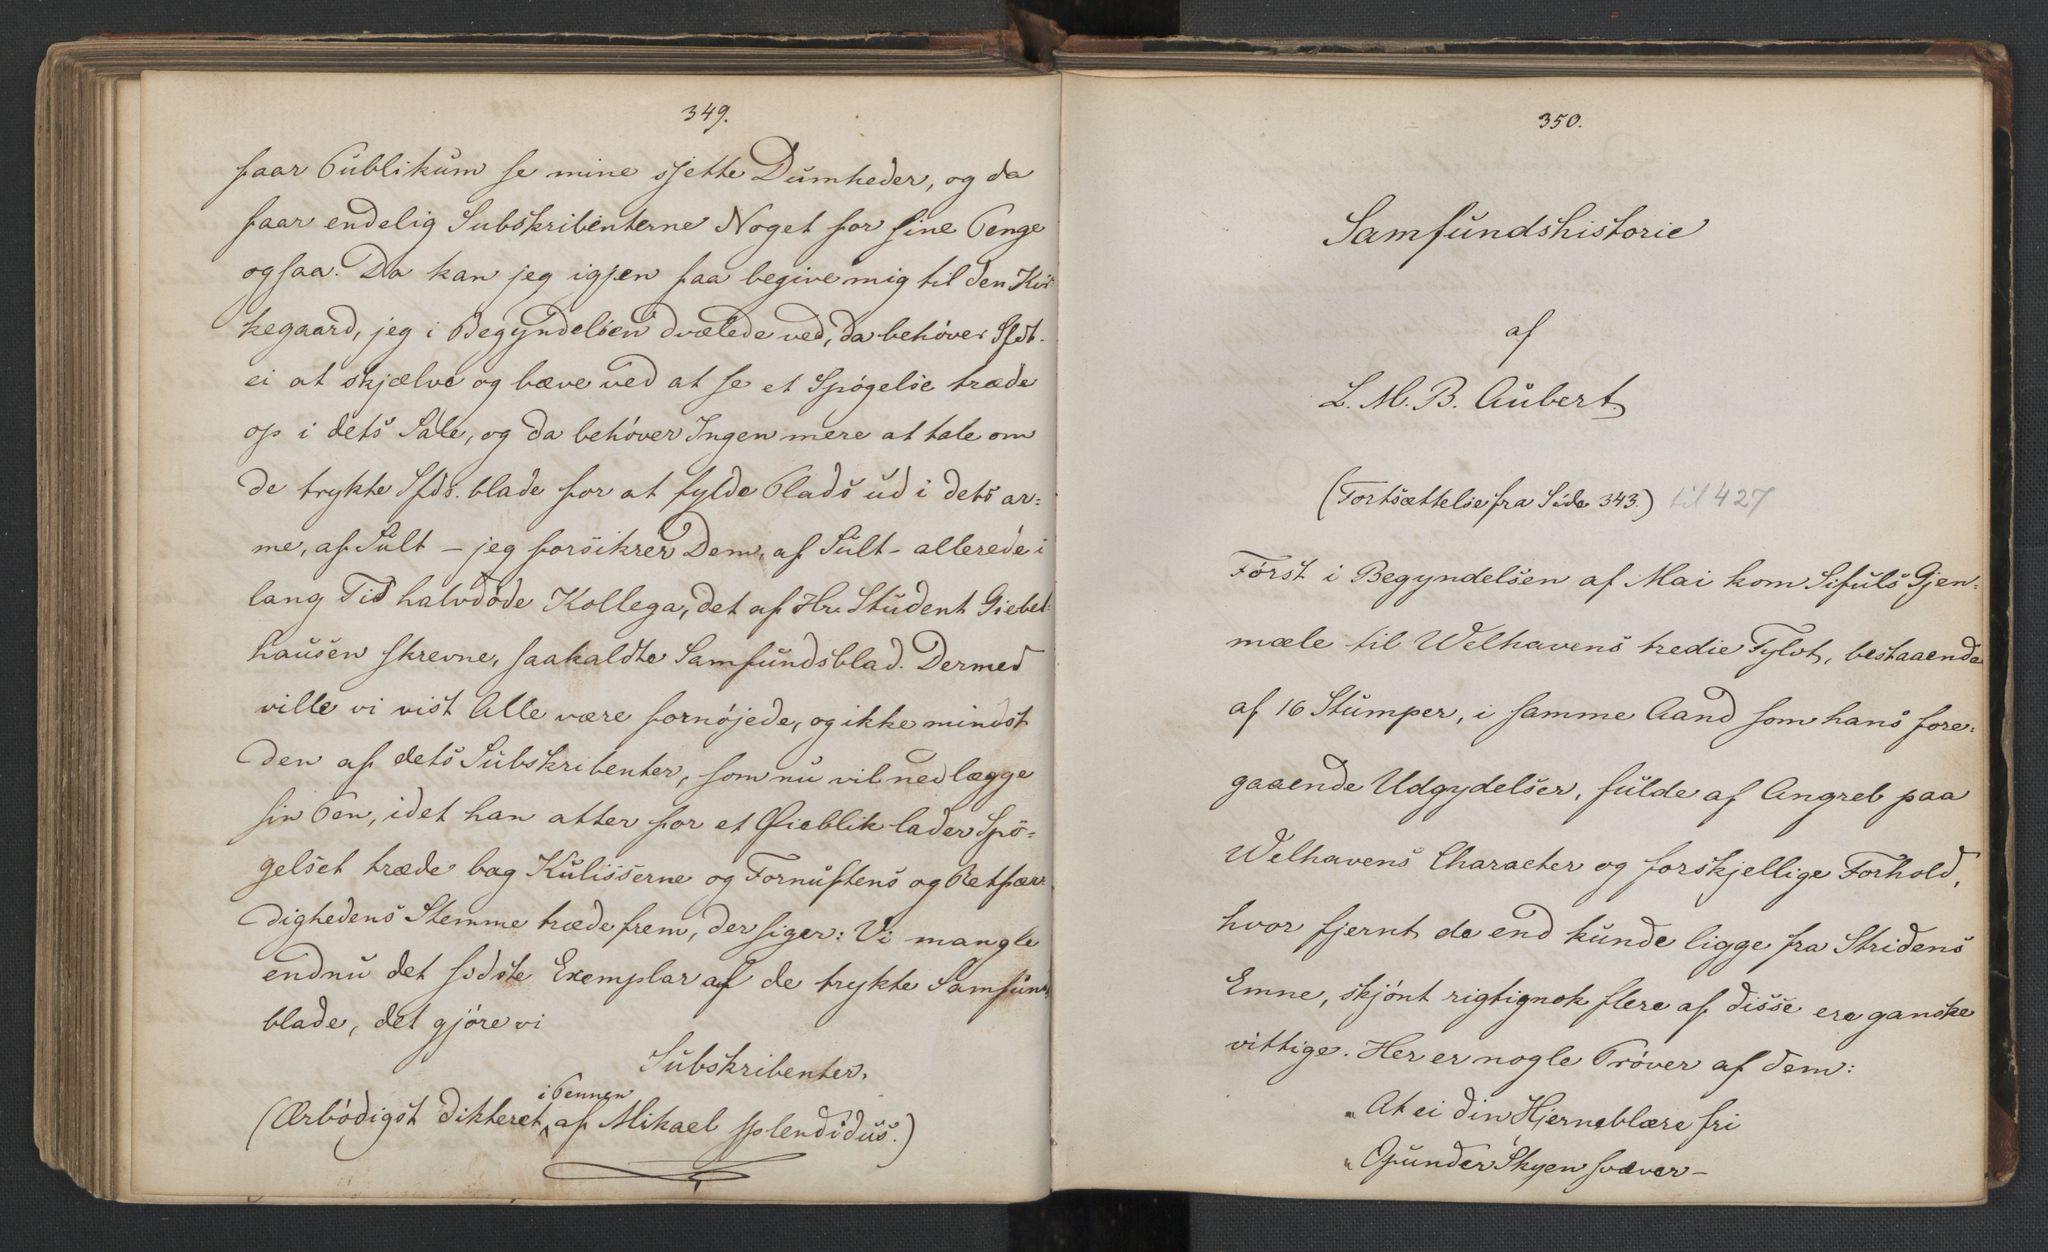 RA, Det Norske Studentersamfund, X/Xa/L0006, 1856-1857, s. 179